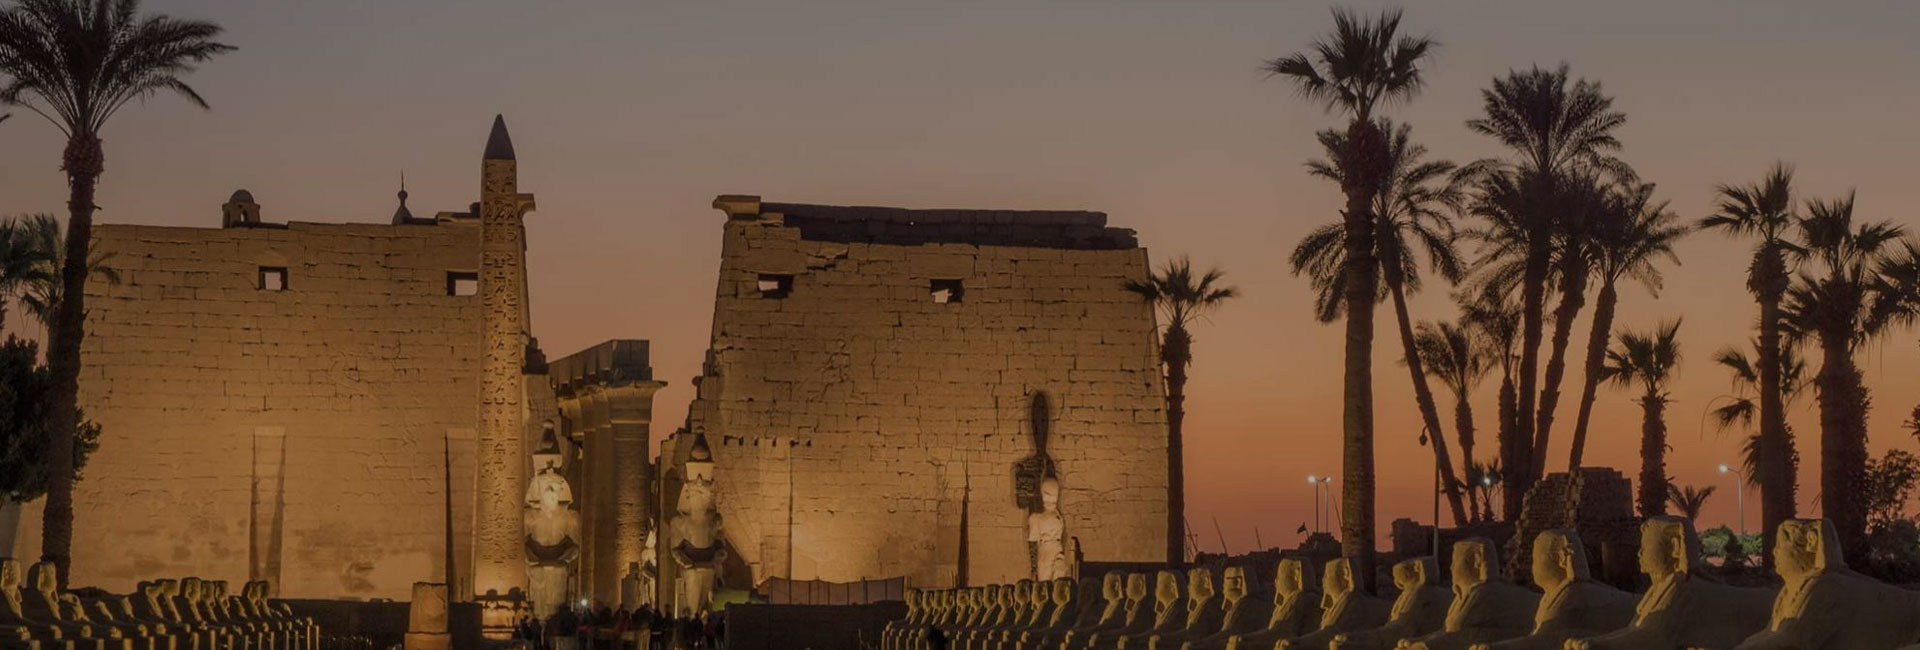 Abu Simbel to Luxor Tours